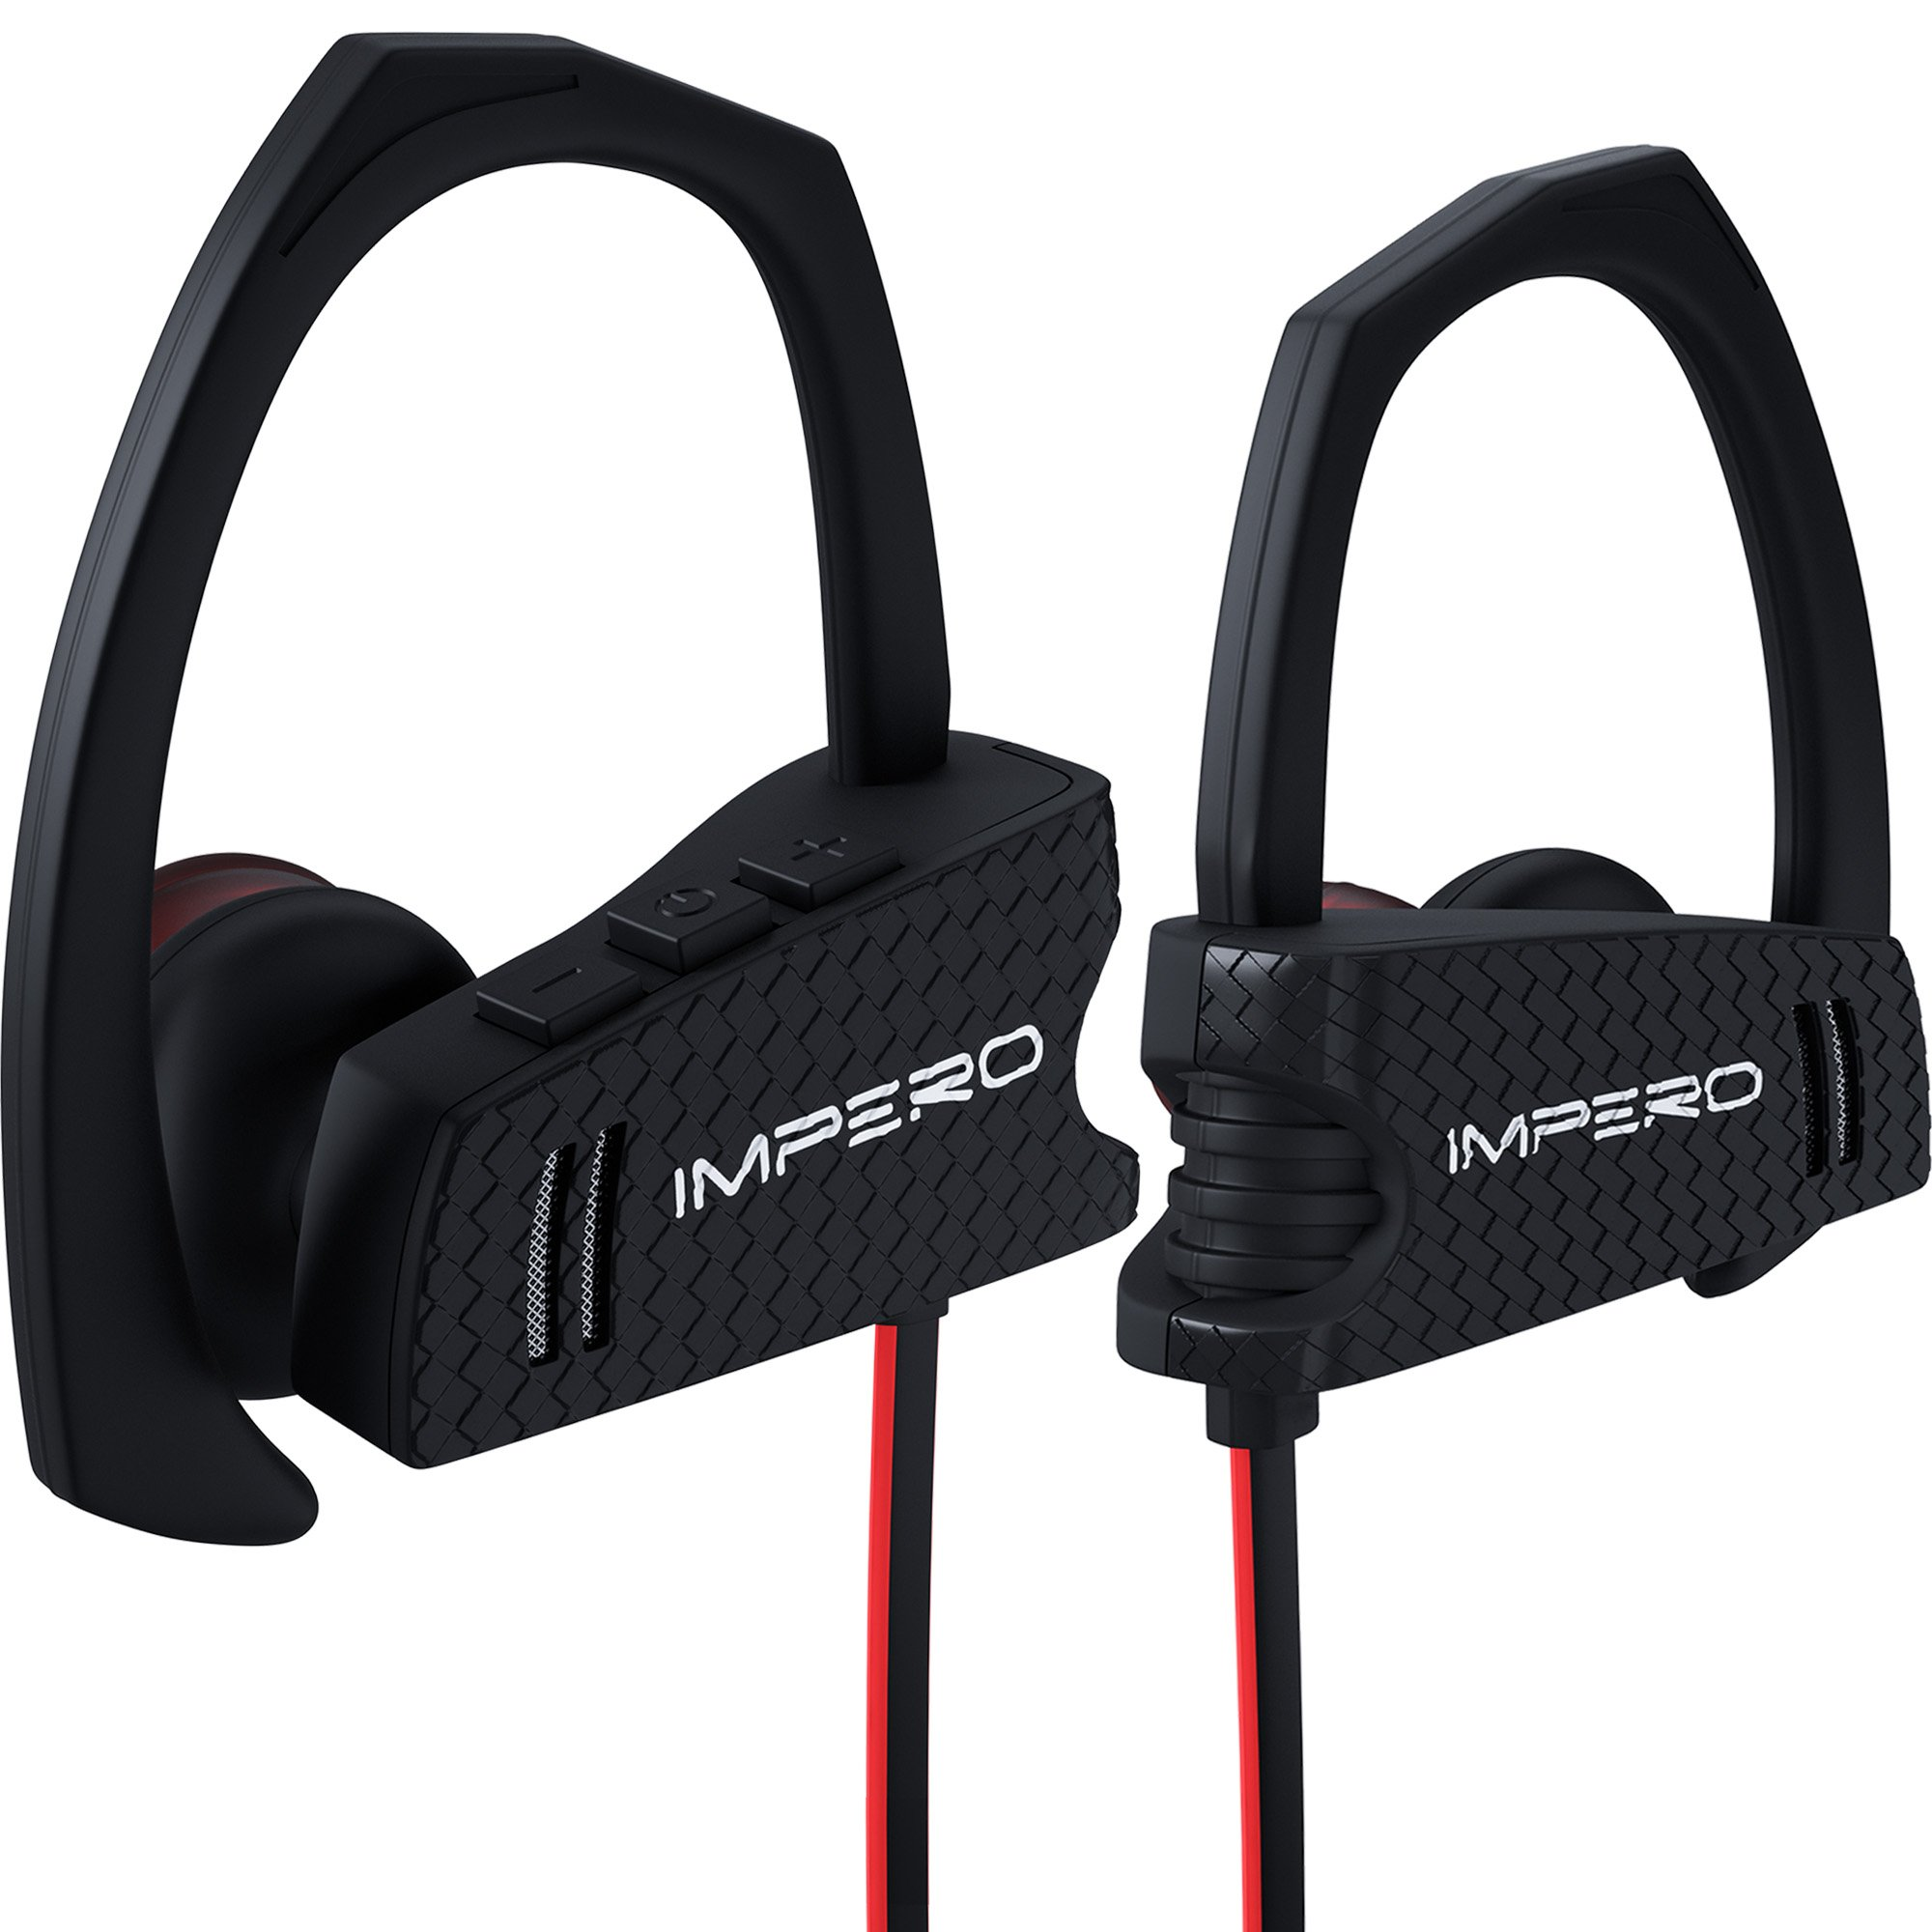 Wireless Headphones IMPERO Sport Bluetooth Headphones with Microphone, Wireless Earbuds Sport Headphones Best Bluetooth Earbuds Wireless Bluetooth Headphones Running Headphones Workout Headphones